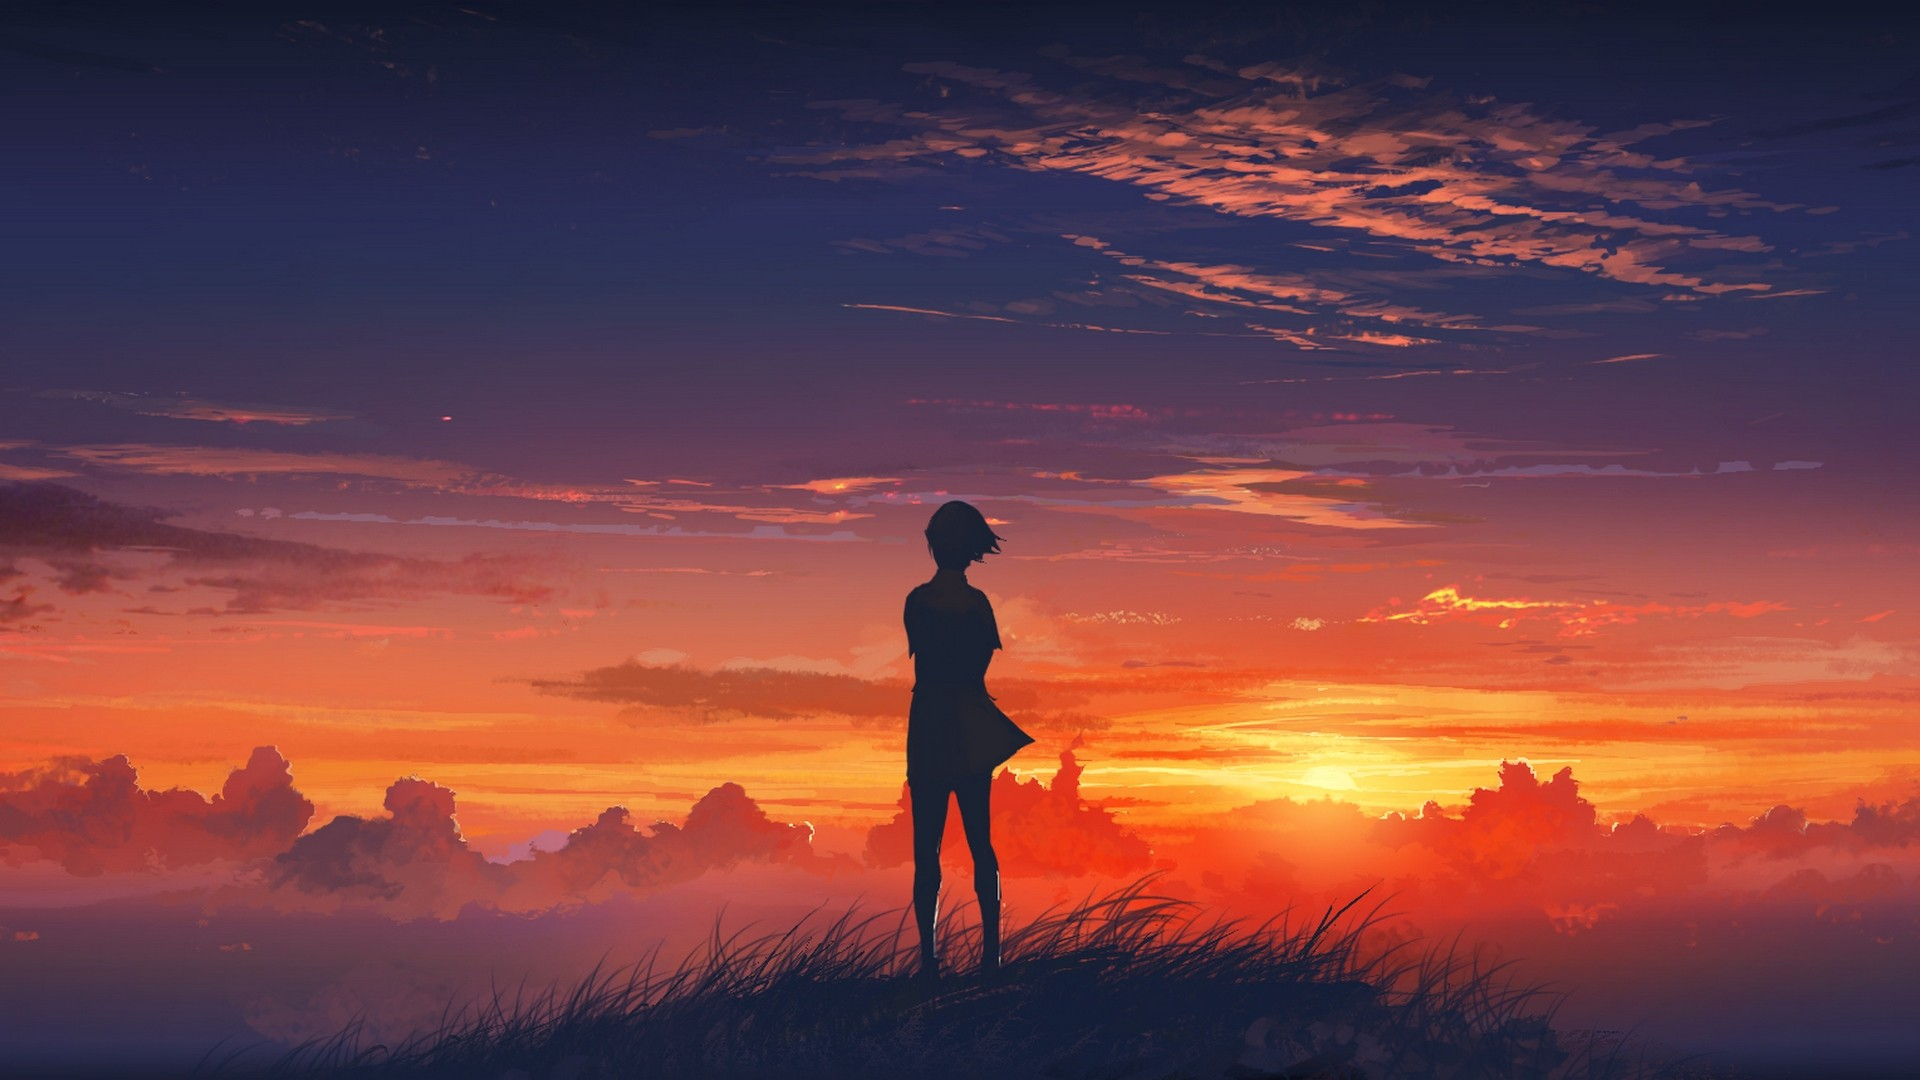 Always love a nice sunset type wallpaper …